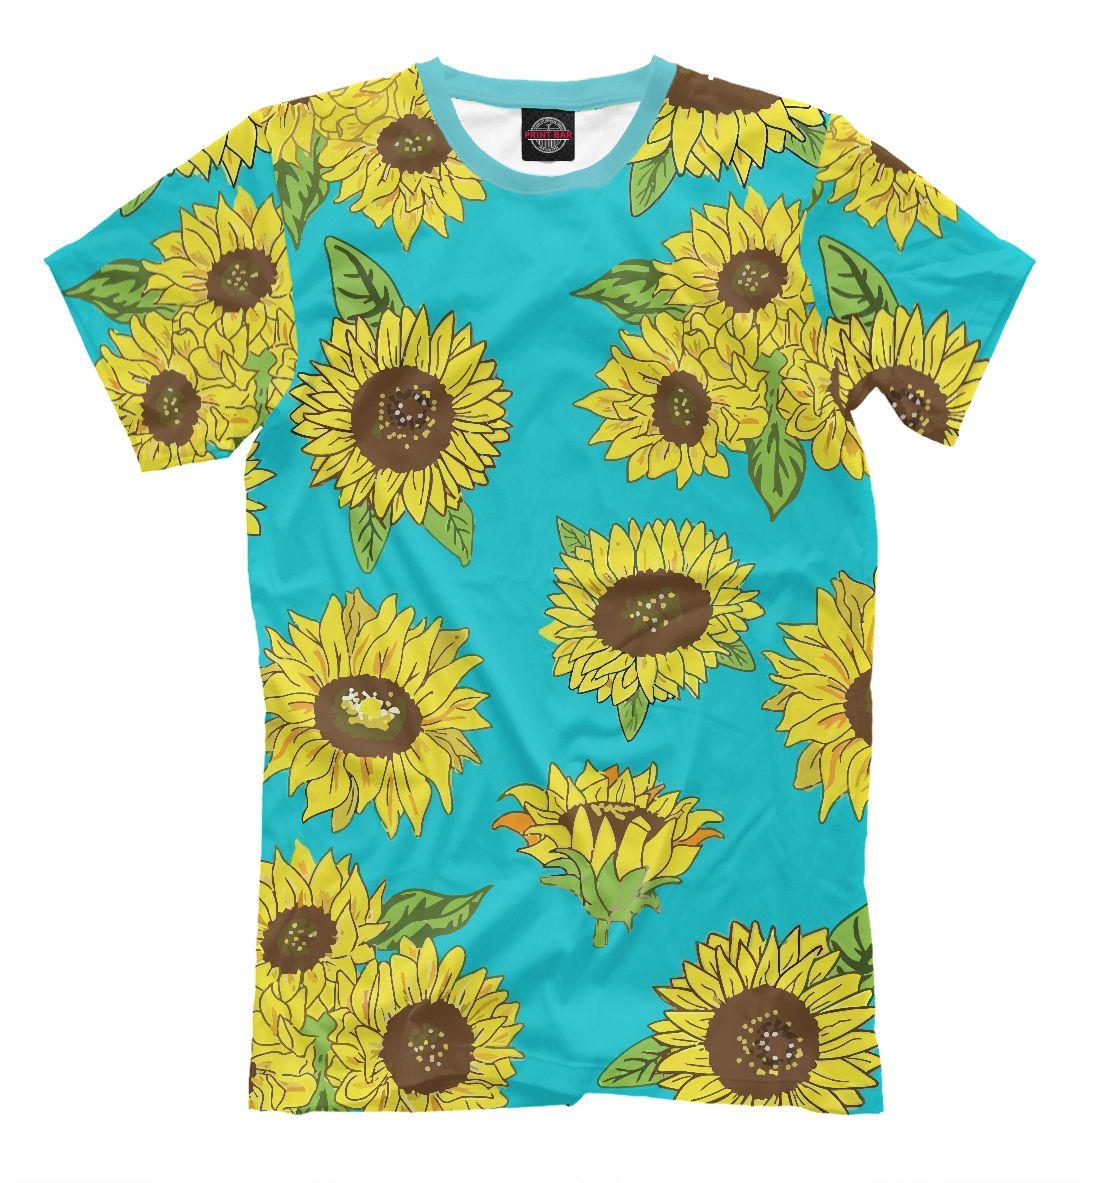 дизайн футболок 1